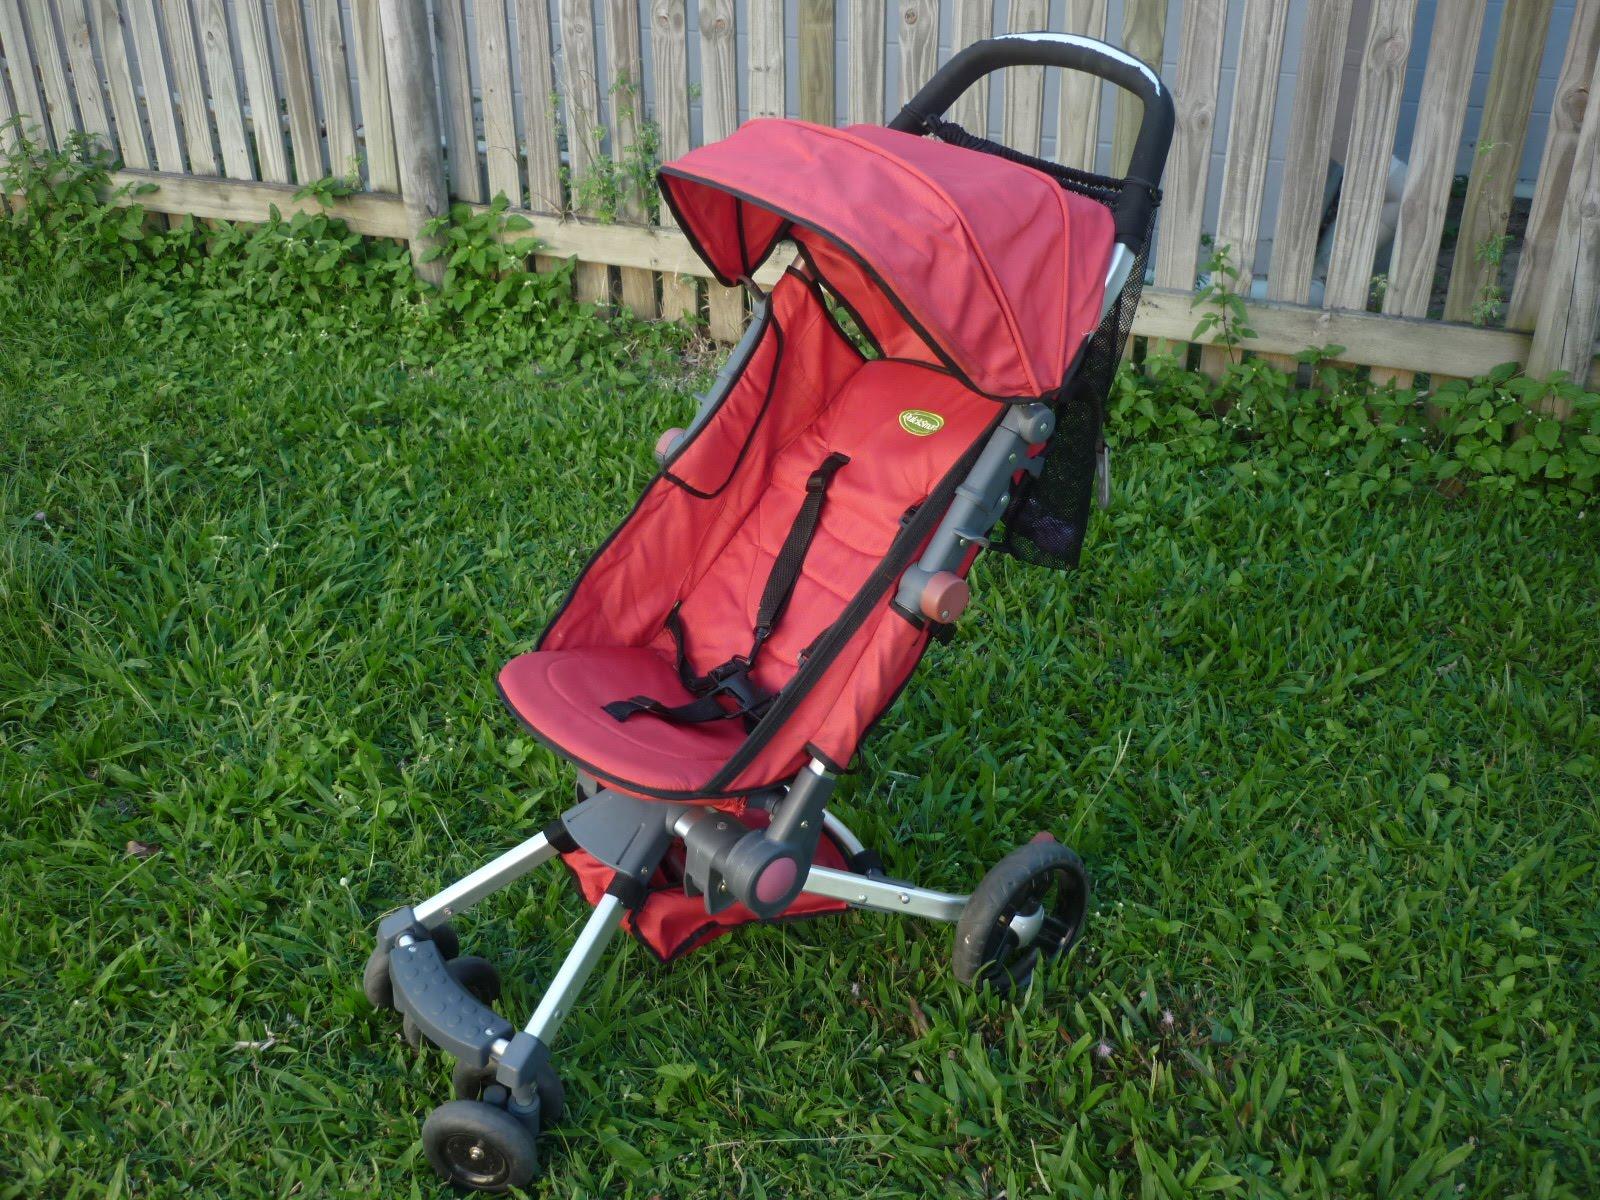 Bello Baby Review: QuickSmart Easy Fold Stroller